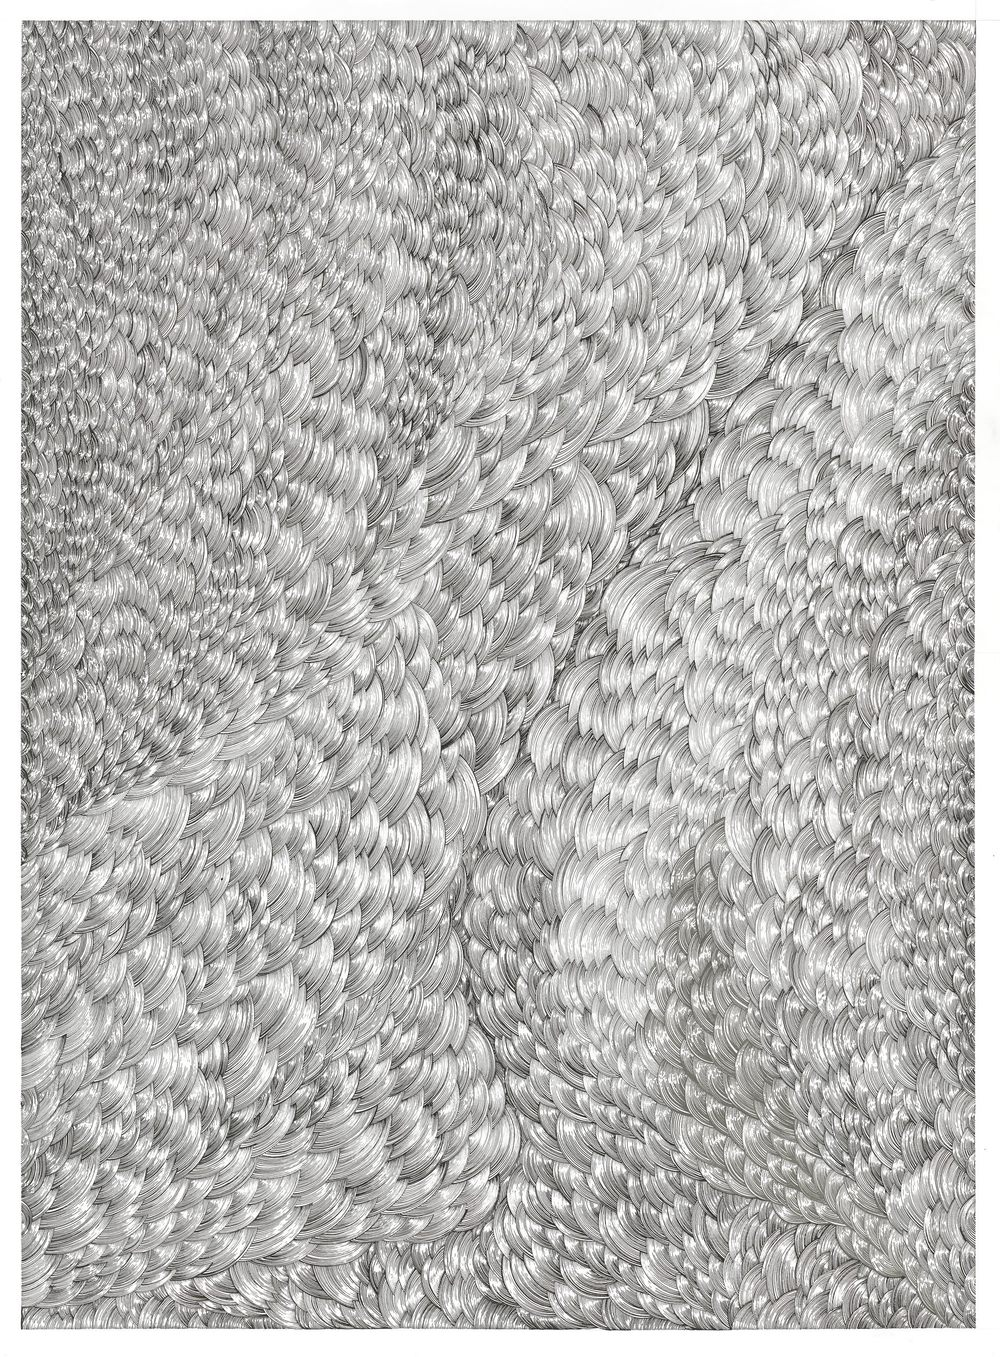 BK P158   diptychon part B   untitled   acrylic on paper   200x170cm_2014   collection kunstwerk alison u. peter w. klein